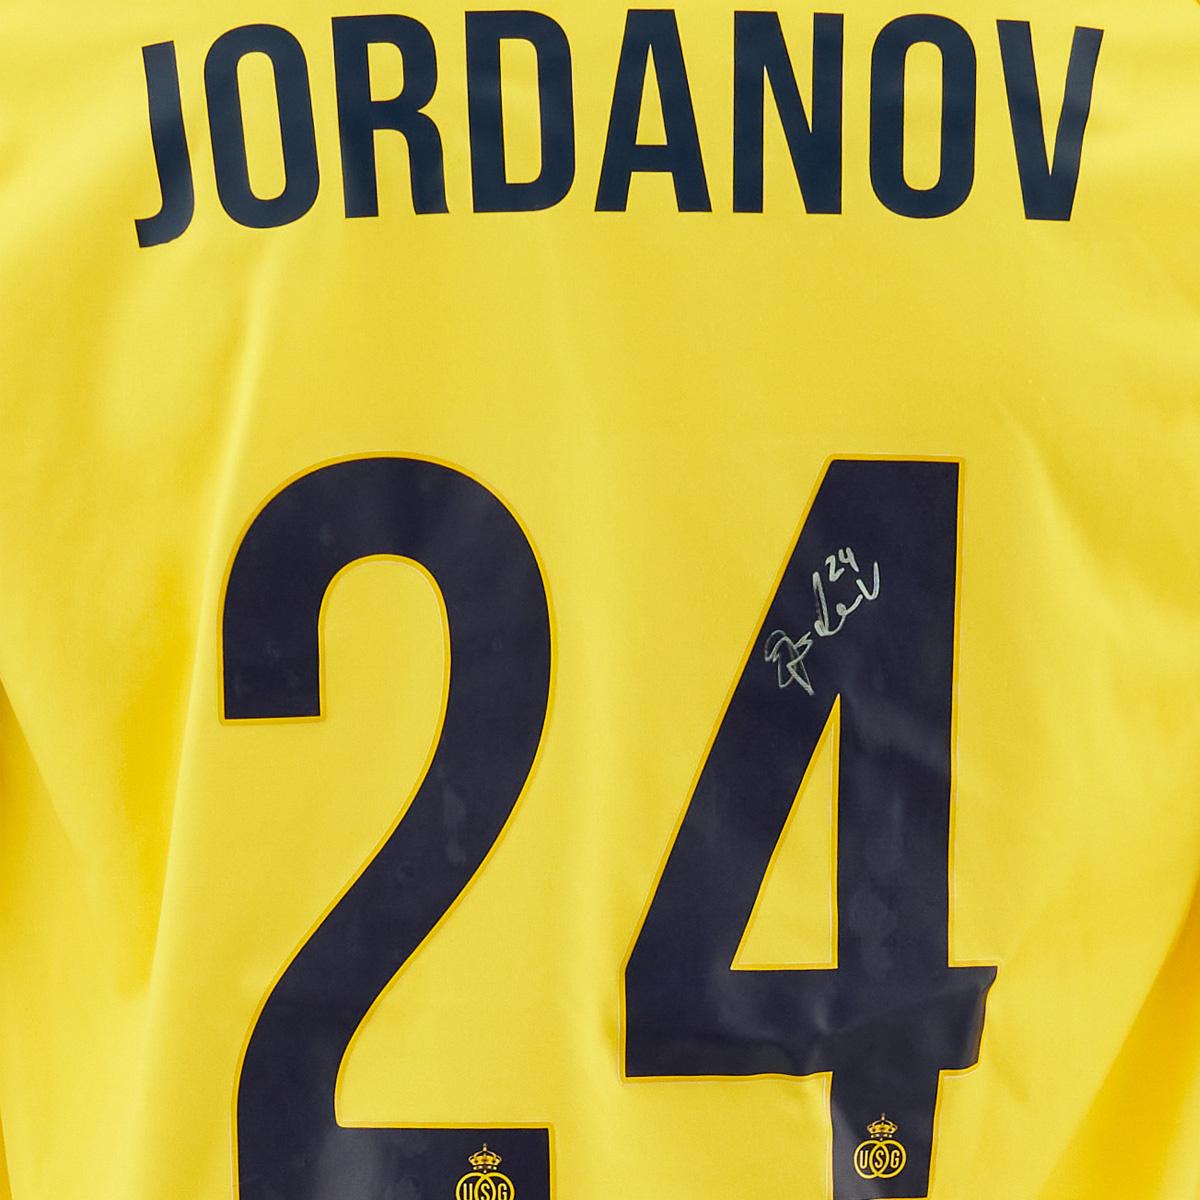 Topfanz #24 Edisson Jordanov